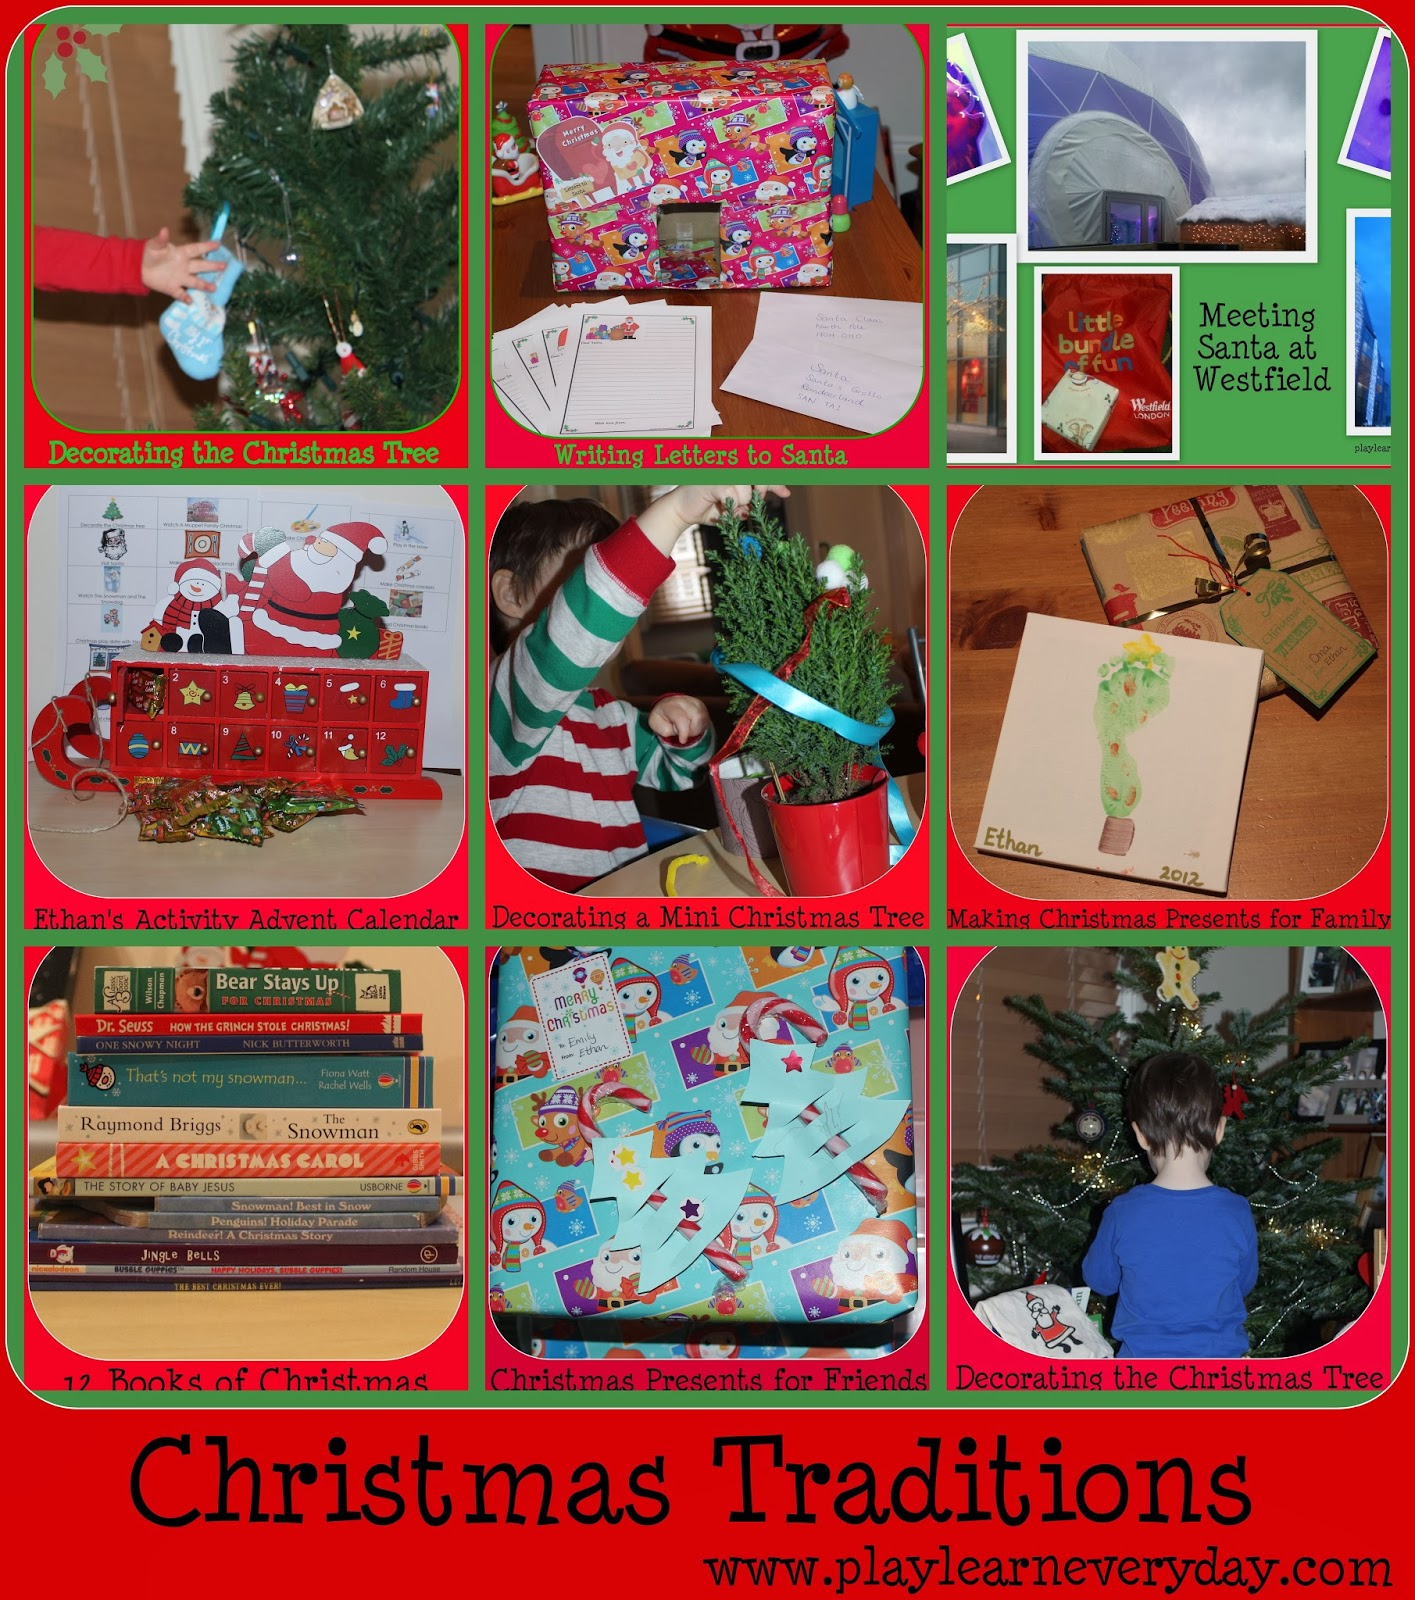 Xmas or Christmas? - Theology Impact